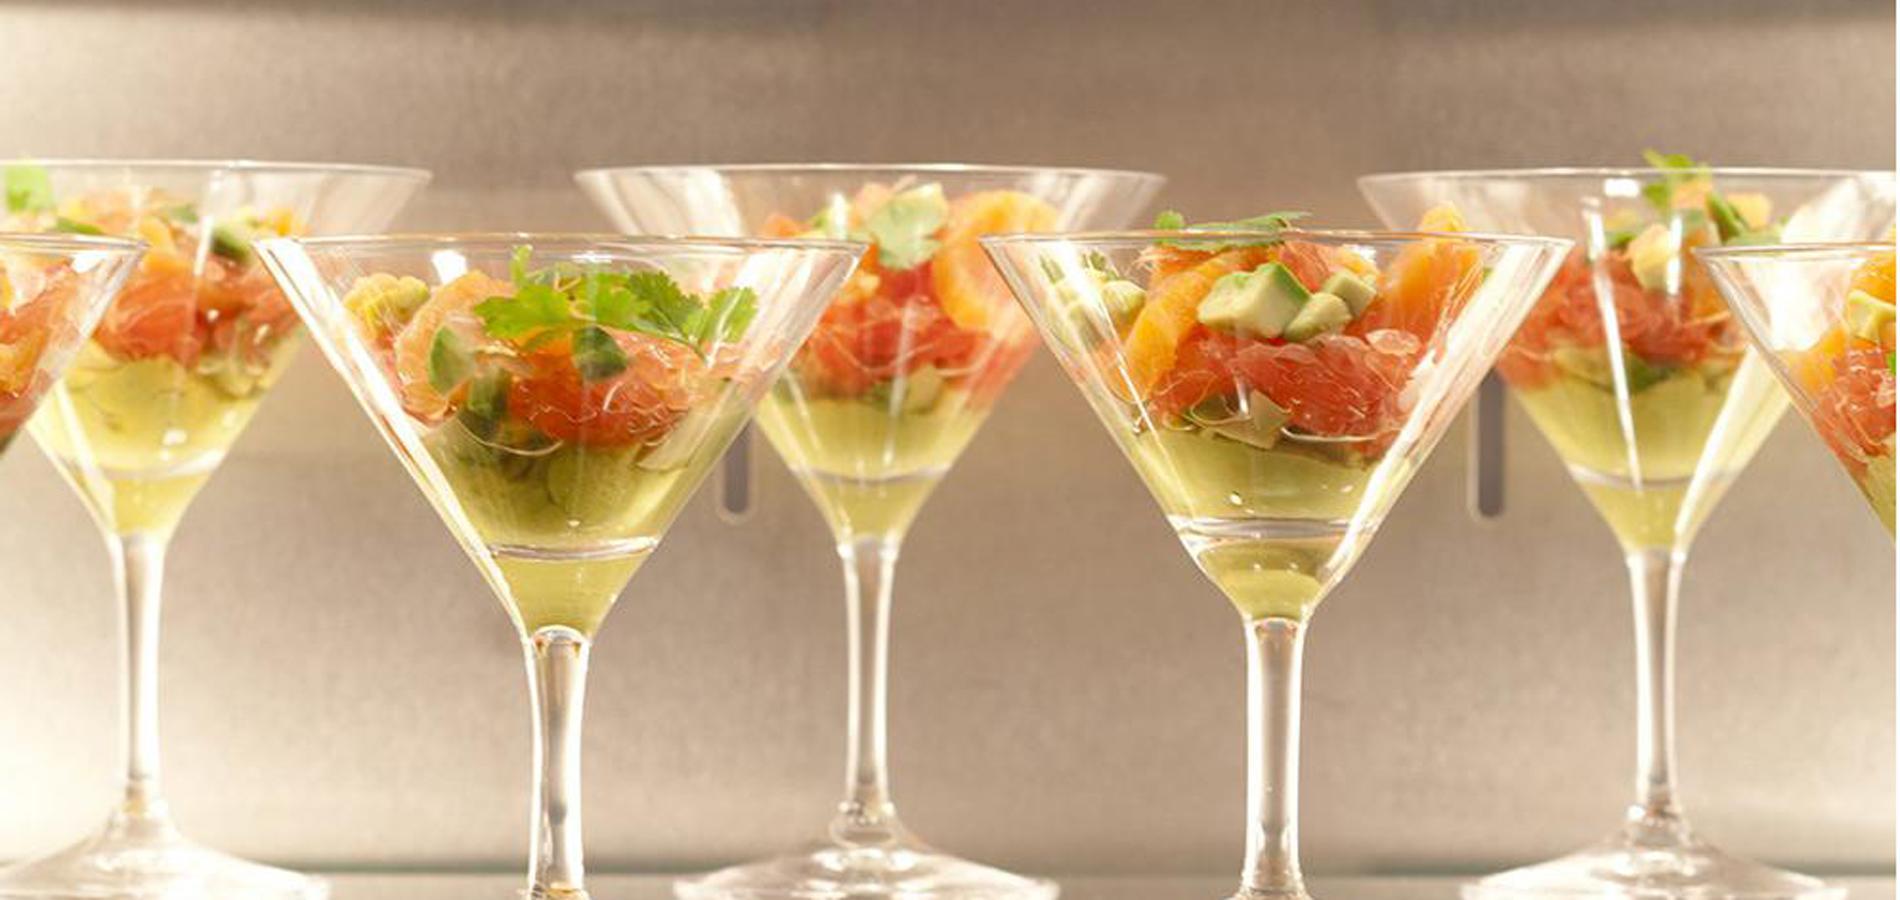 Nos Plus Belles Idees Recettes De Verrines Salees Pour Briller A L Apero Cuisine Madame Figaro